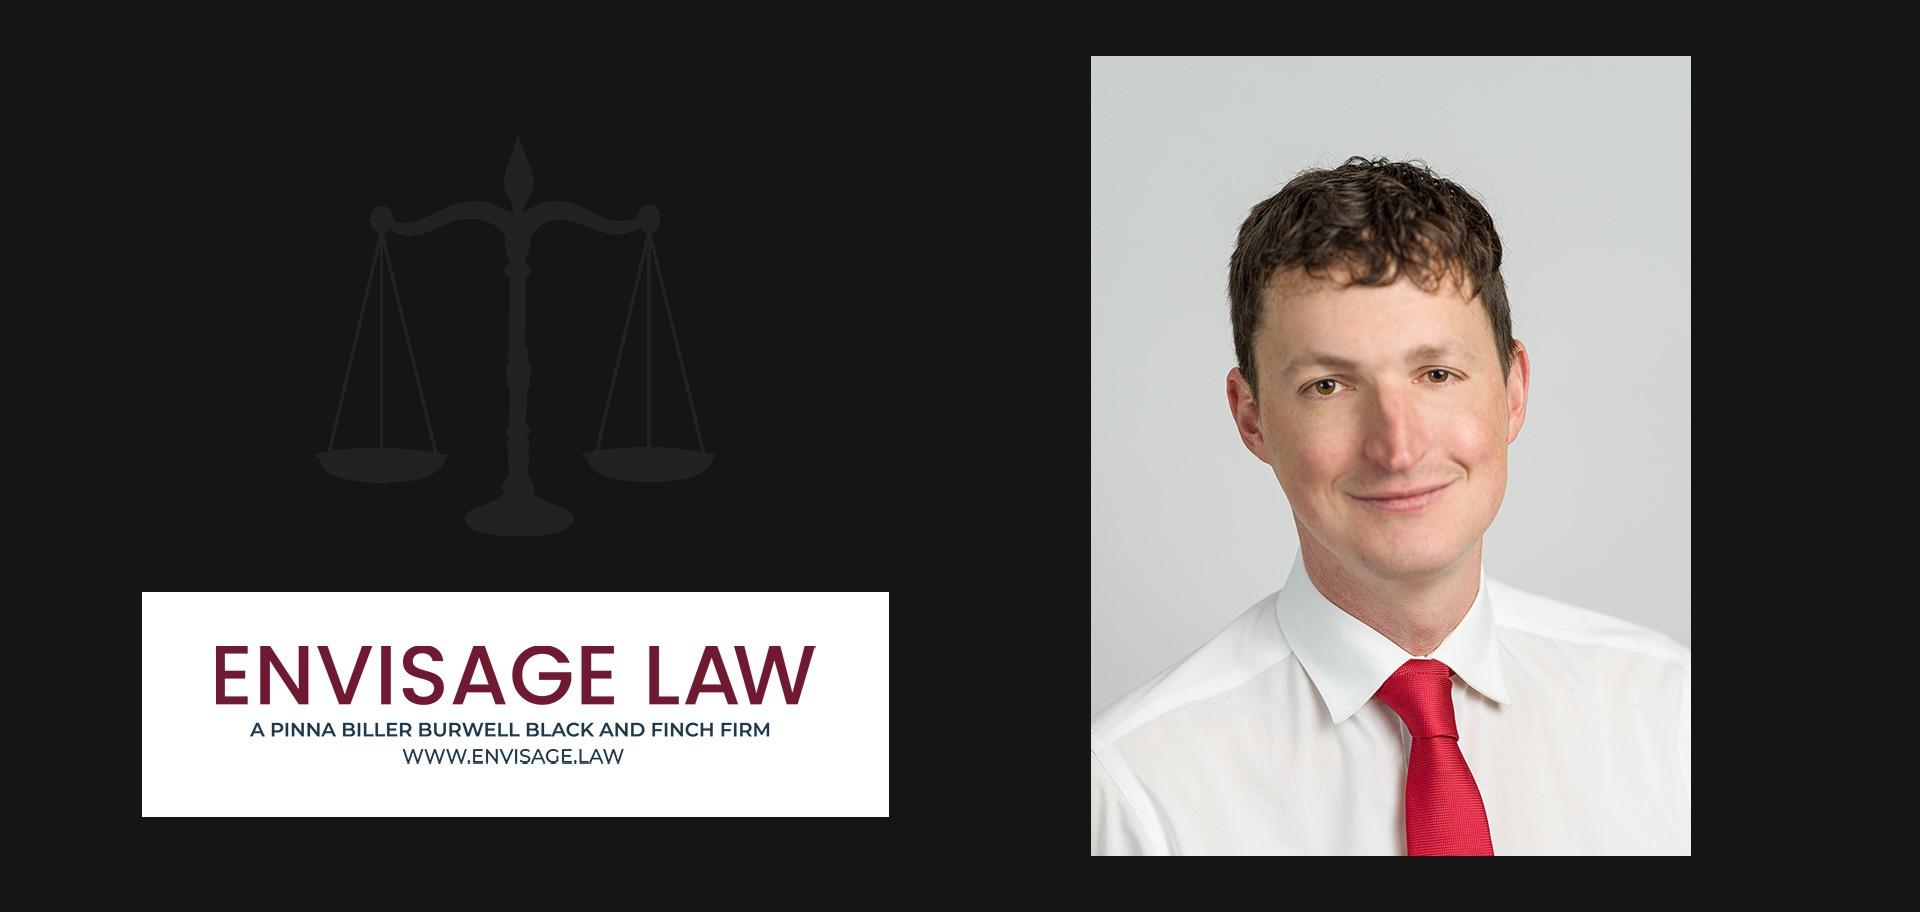 James Lawrence joins Envisage Law